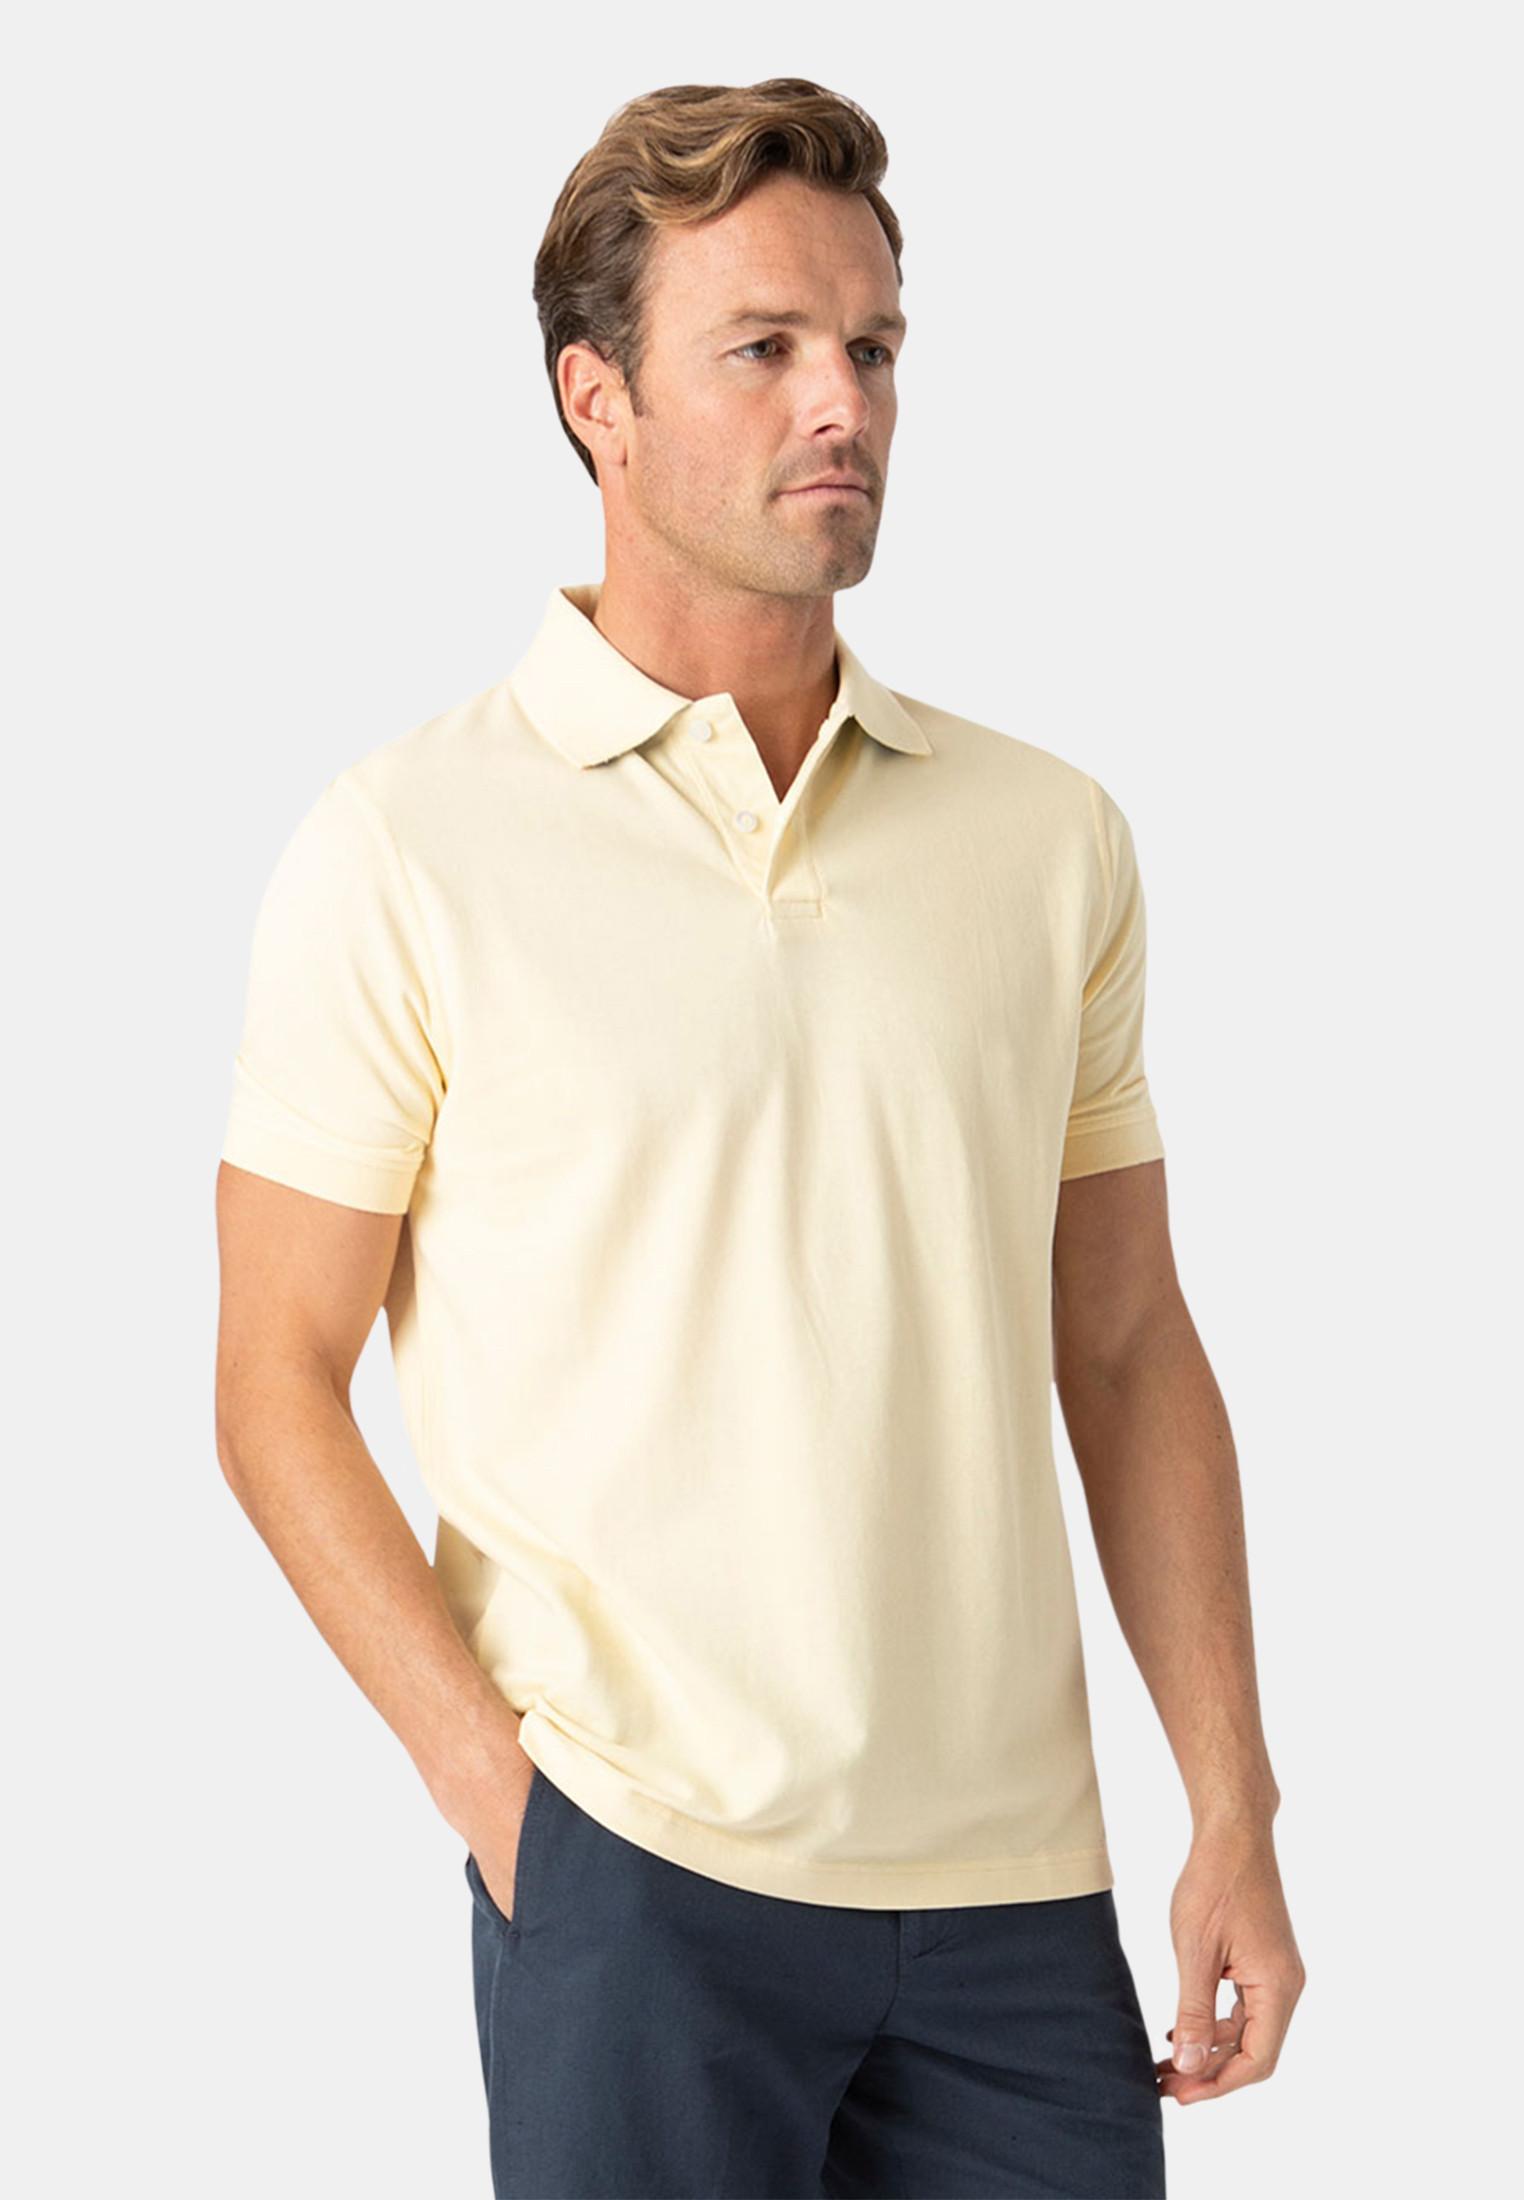 Milford Lemon 100% Pique Cotton Polo Shirt